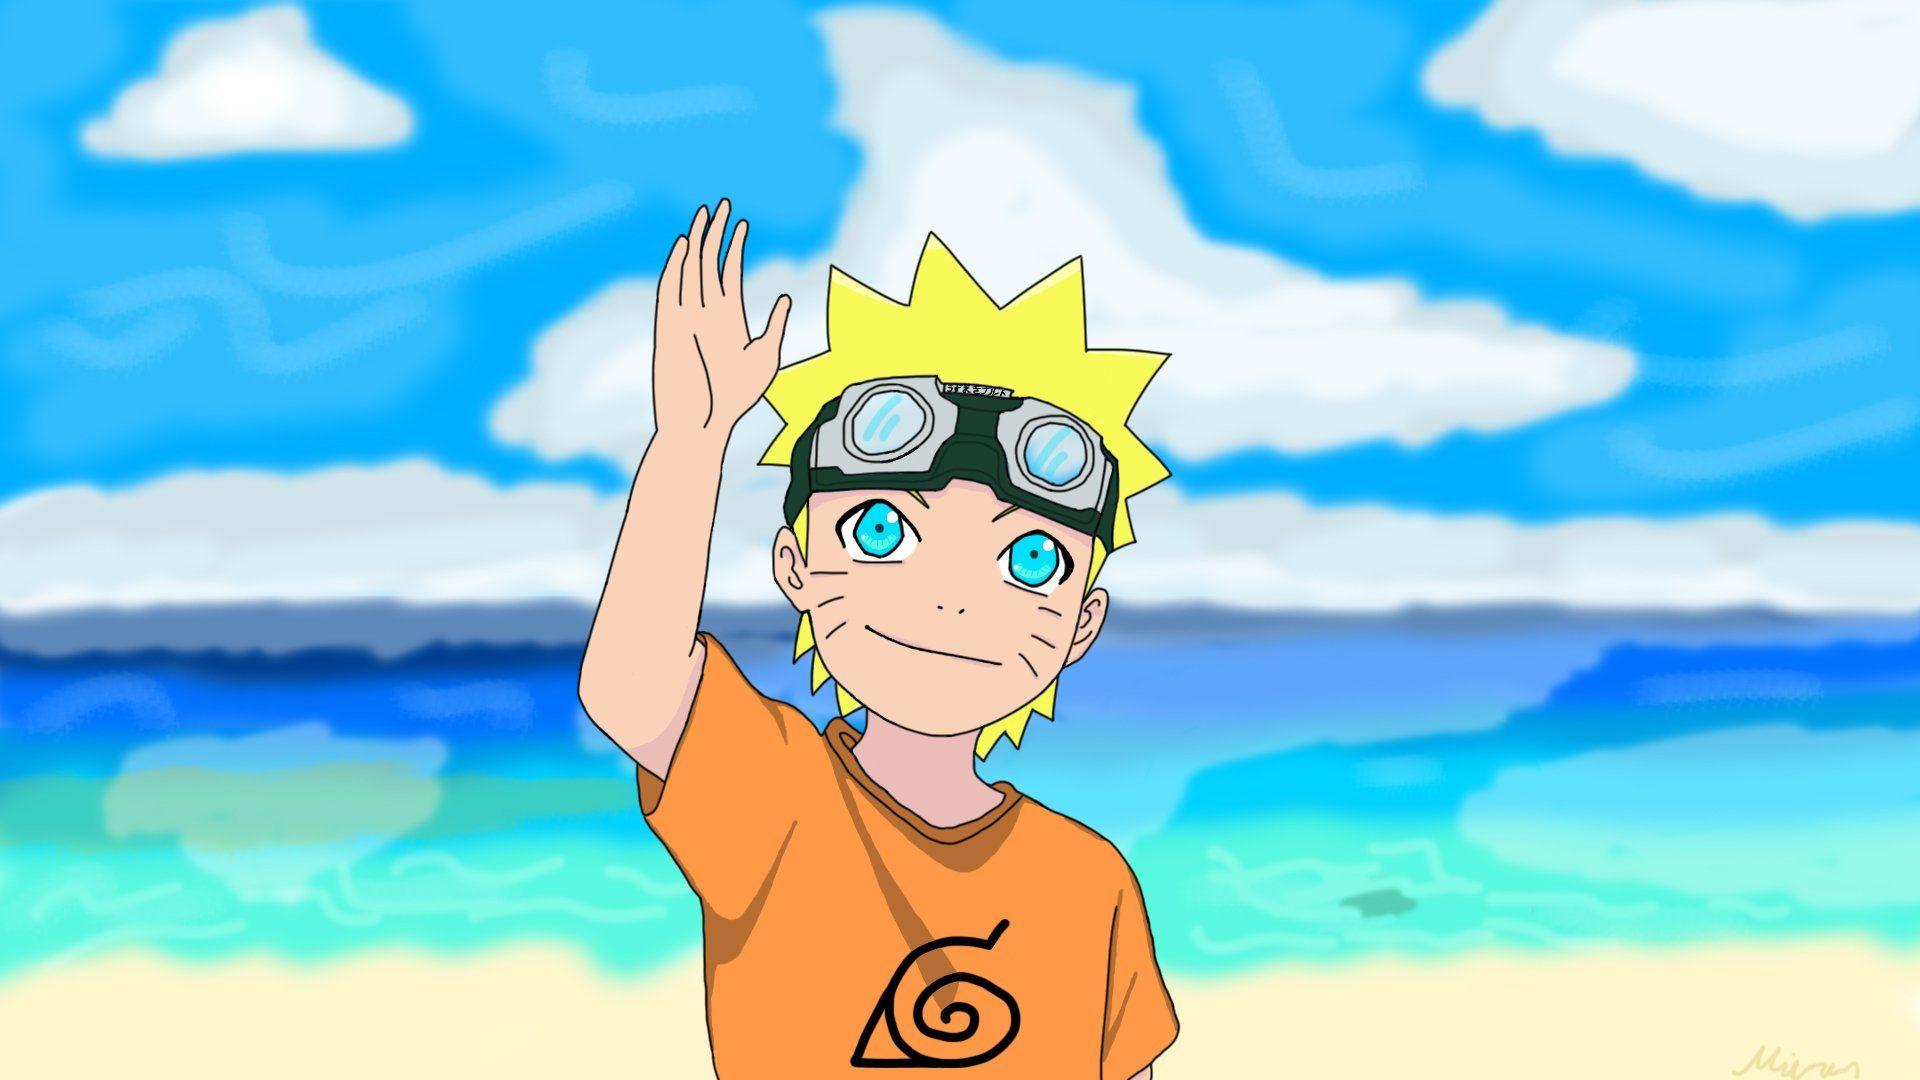 Kid Naruto Wallpapers Top Free Kid Naruto Backgrounds